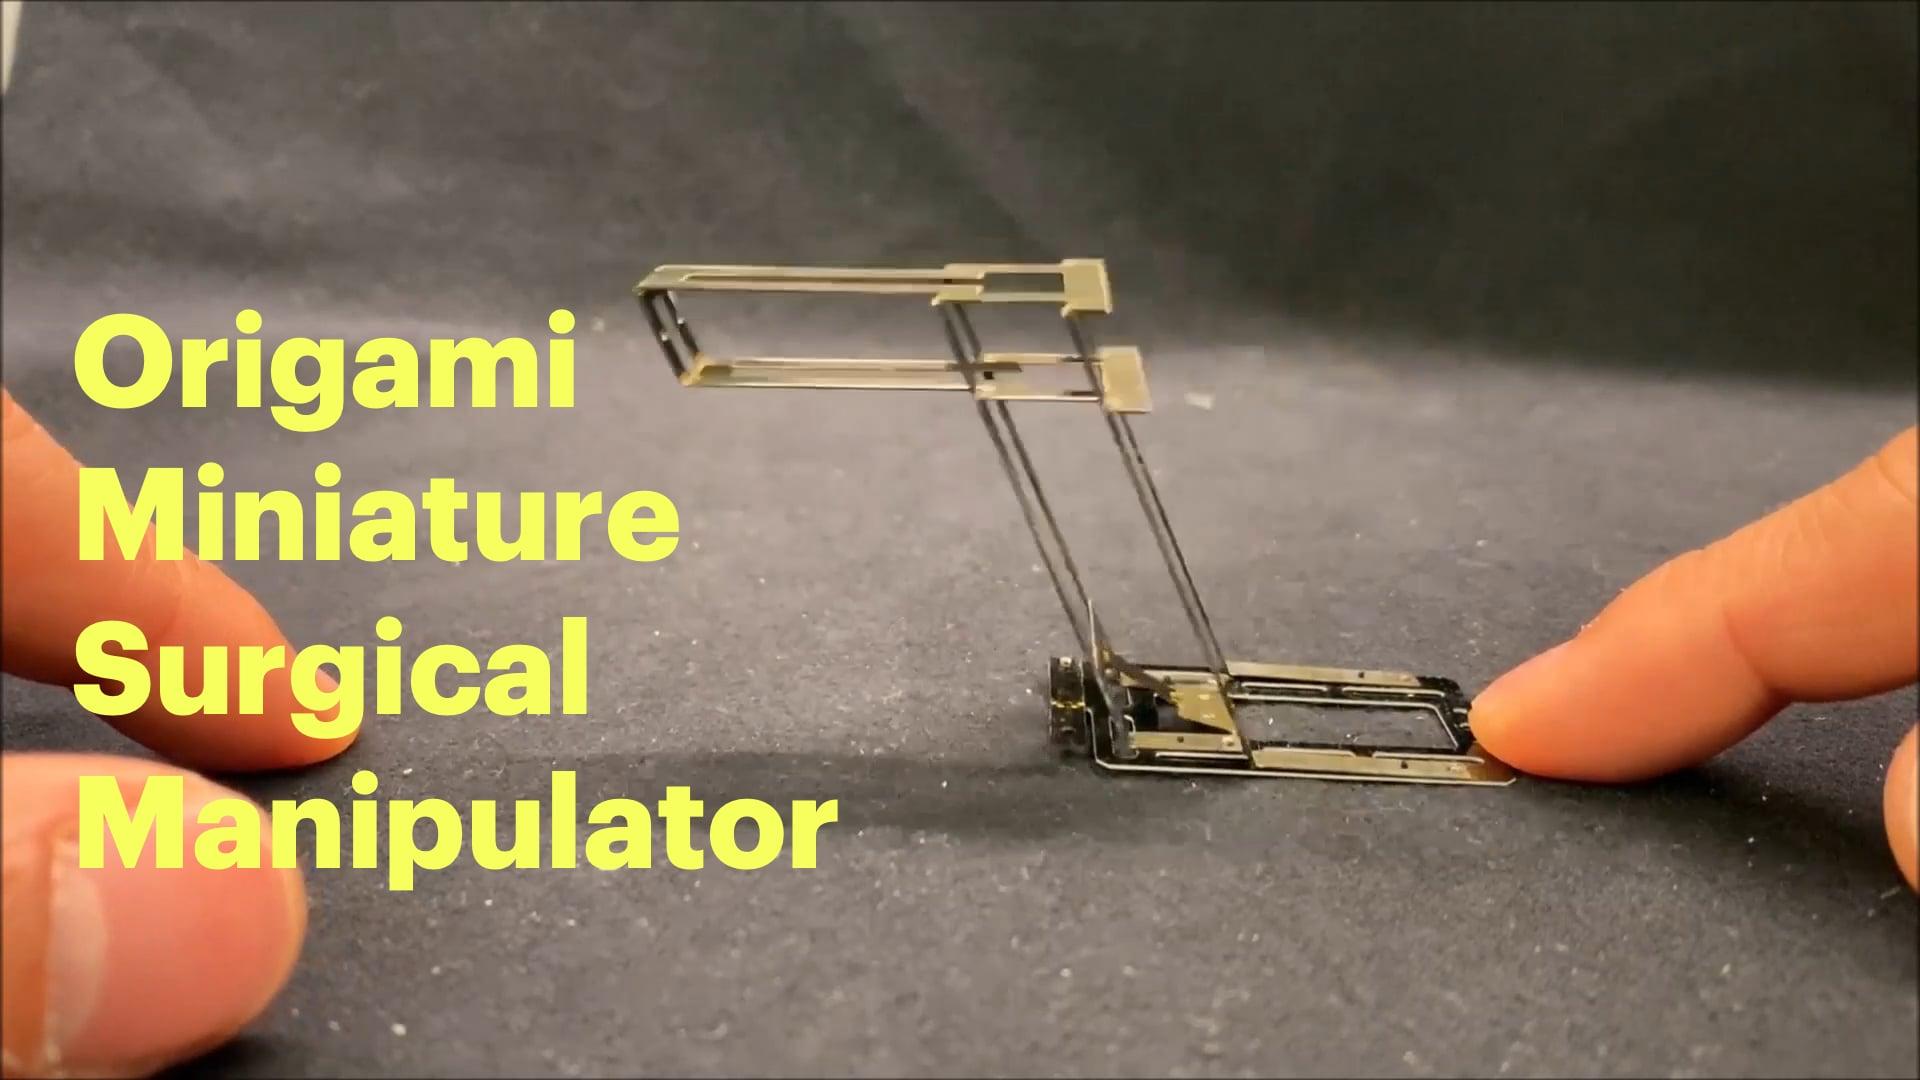 Origami Miniature Surgical Manipulator